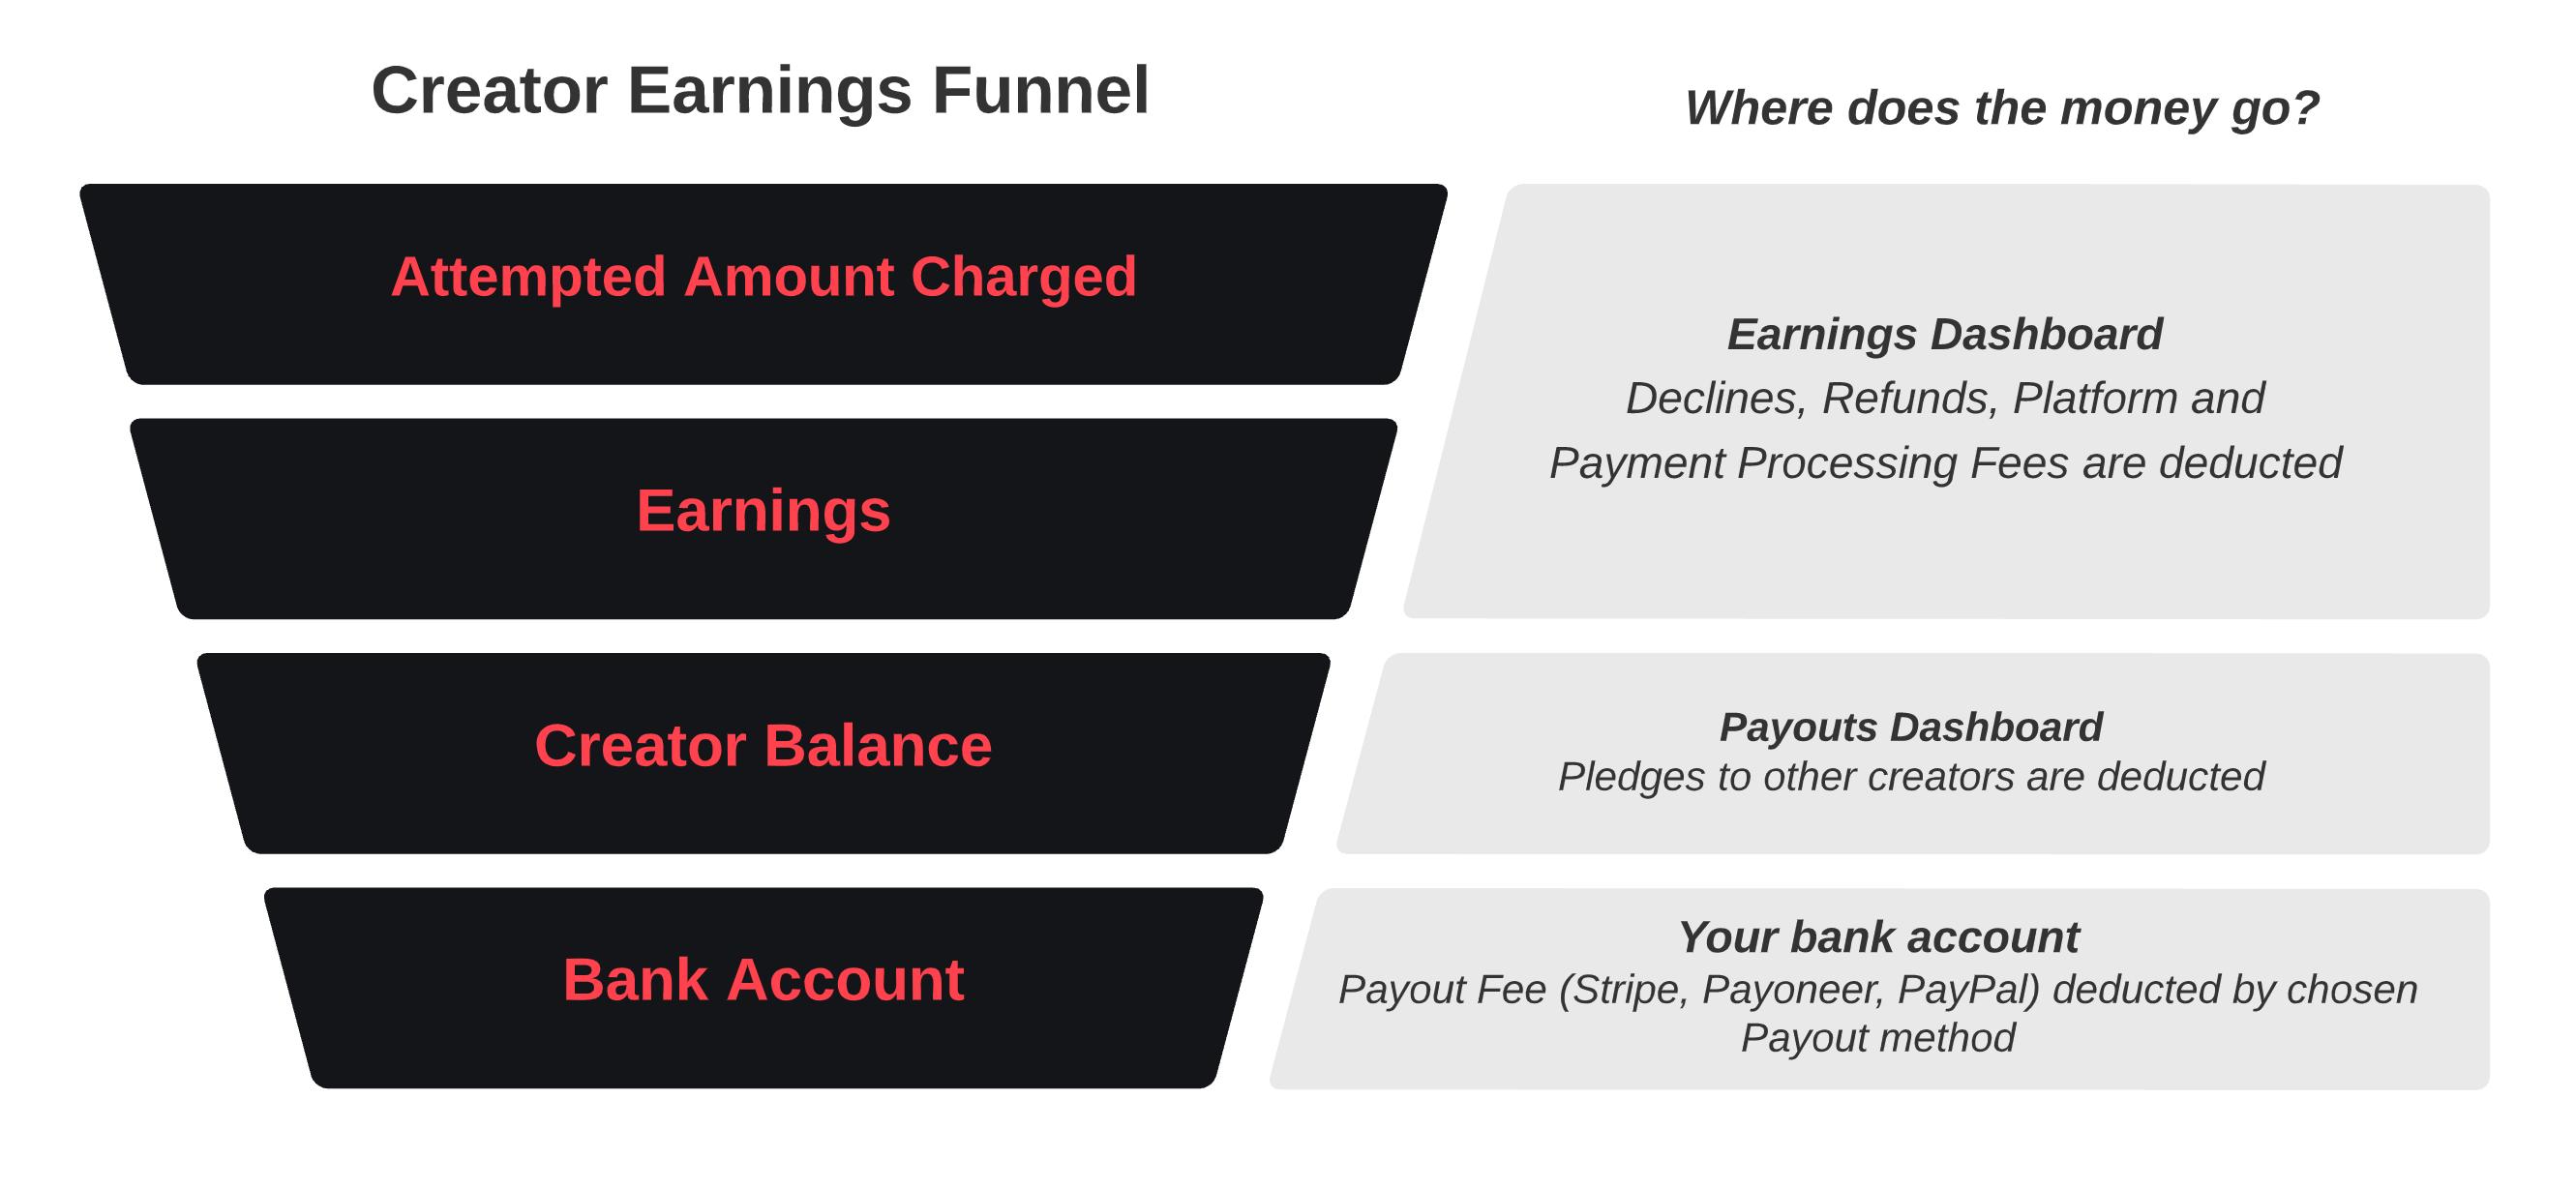 Creator-Earnings-Funnel.png